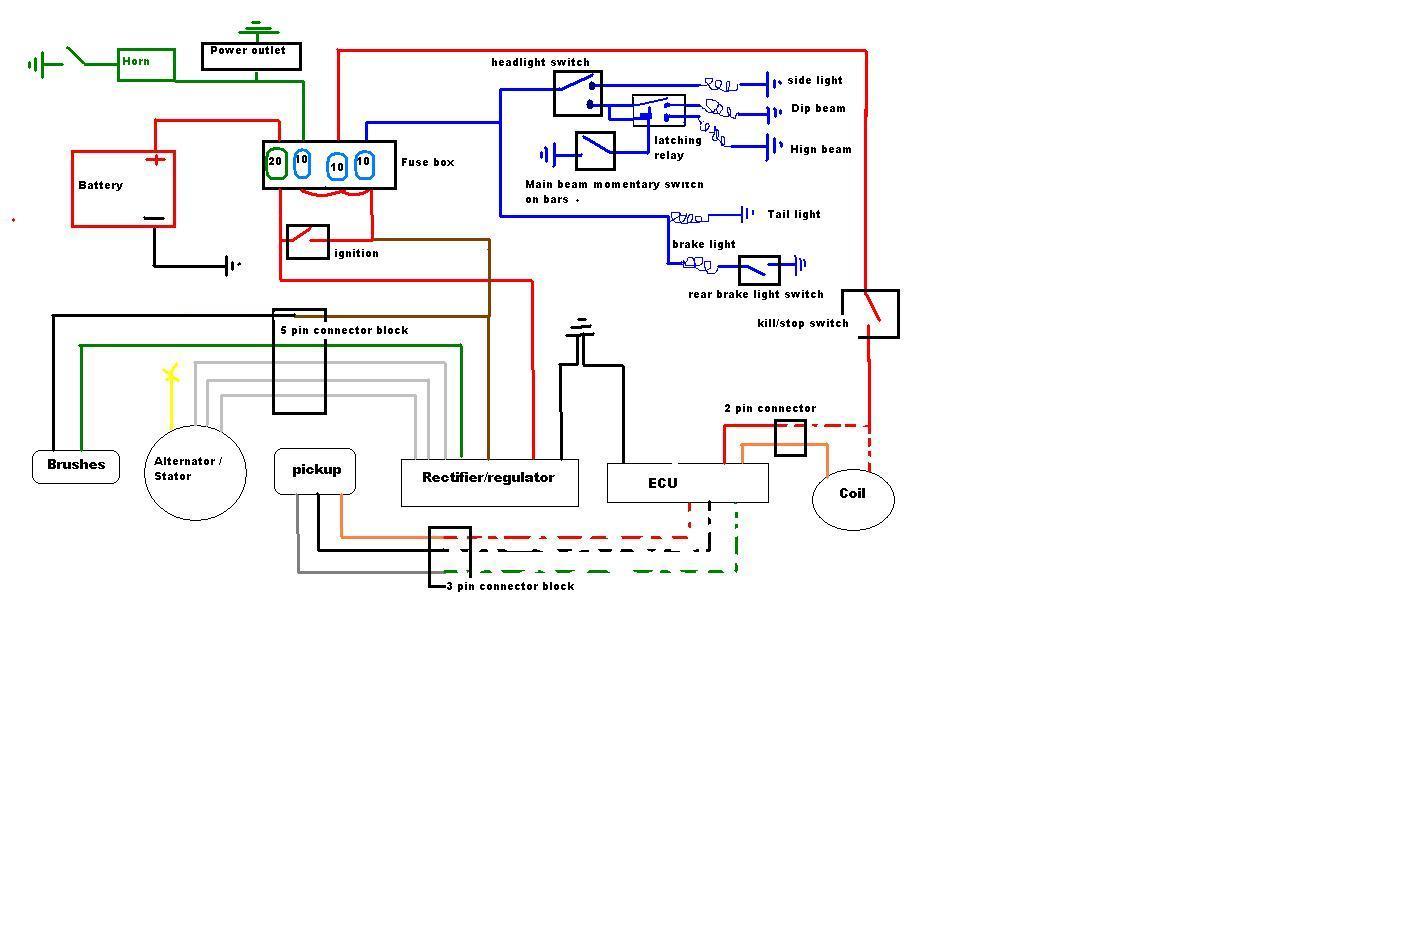 Xt350 Wiring Diagram Libraries Yamaha Yz 60 Diagramsxt350 Library 93